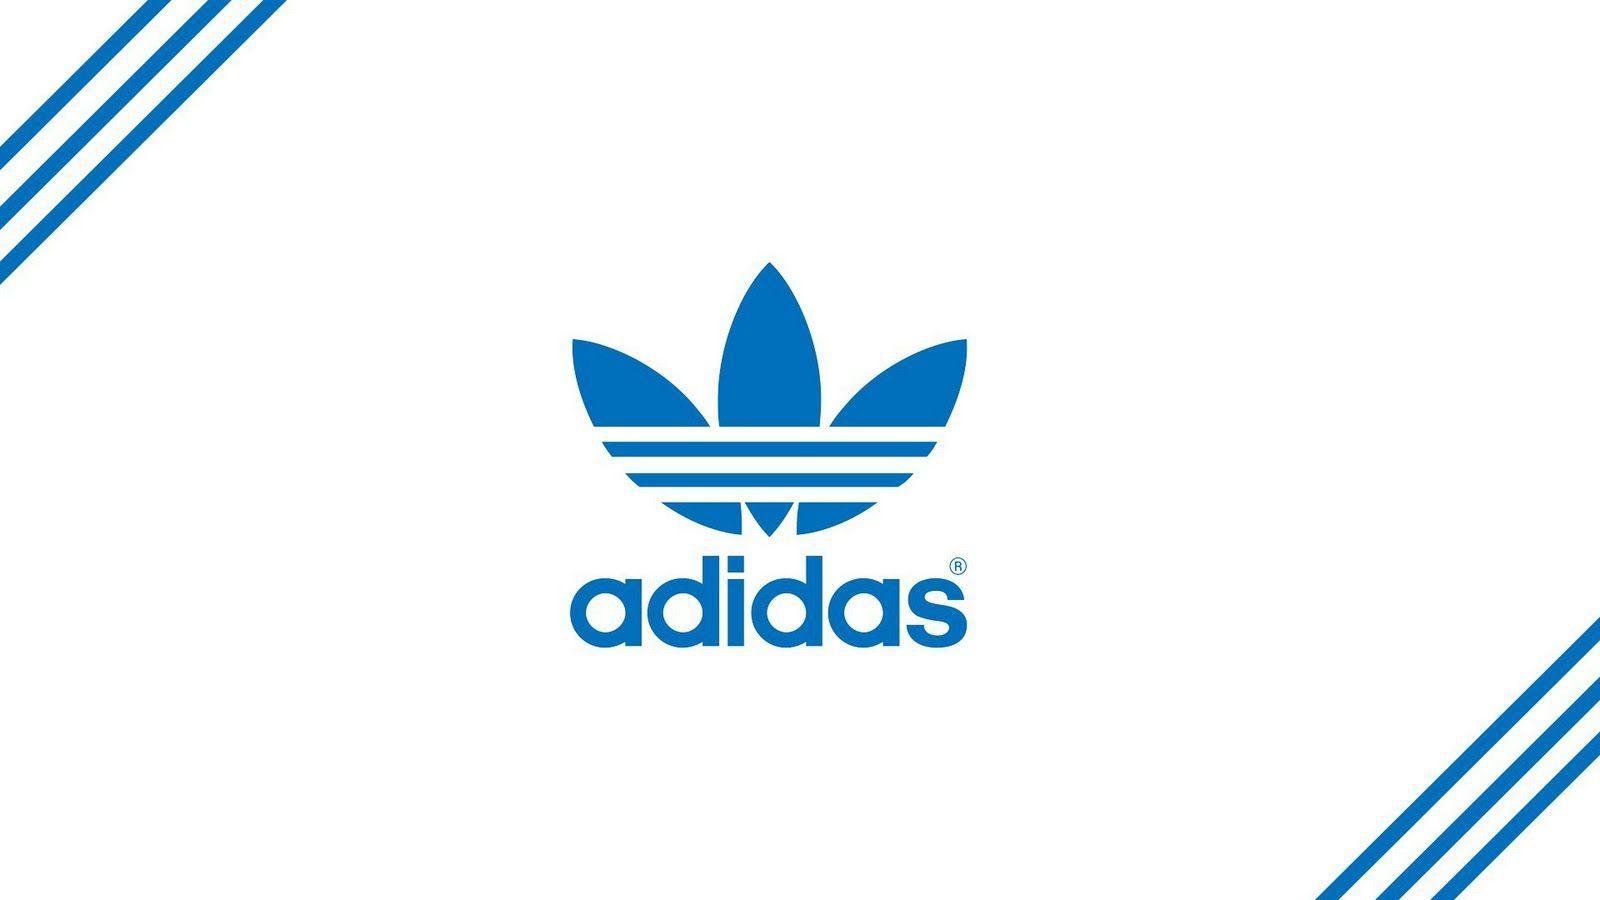 Adidas Logo Wallpapers 1600x900